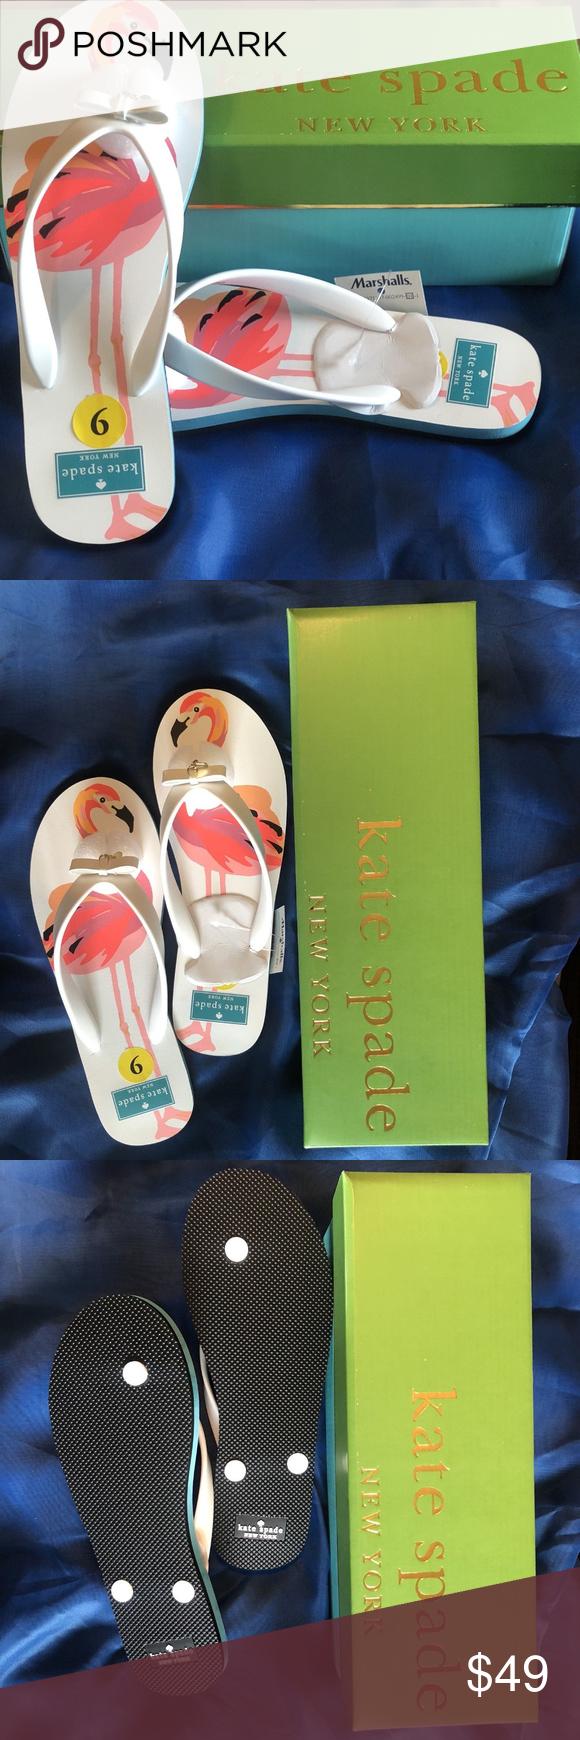 b11a84e19ed9 KATE SPADE NEW YORK Flip Flops White Flamingo 9 Details about NIB KATE  SPADE NEW YORK